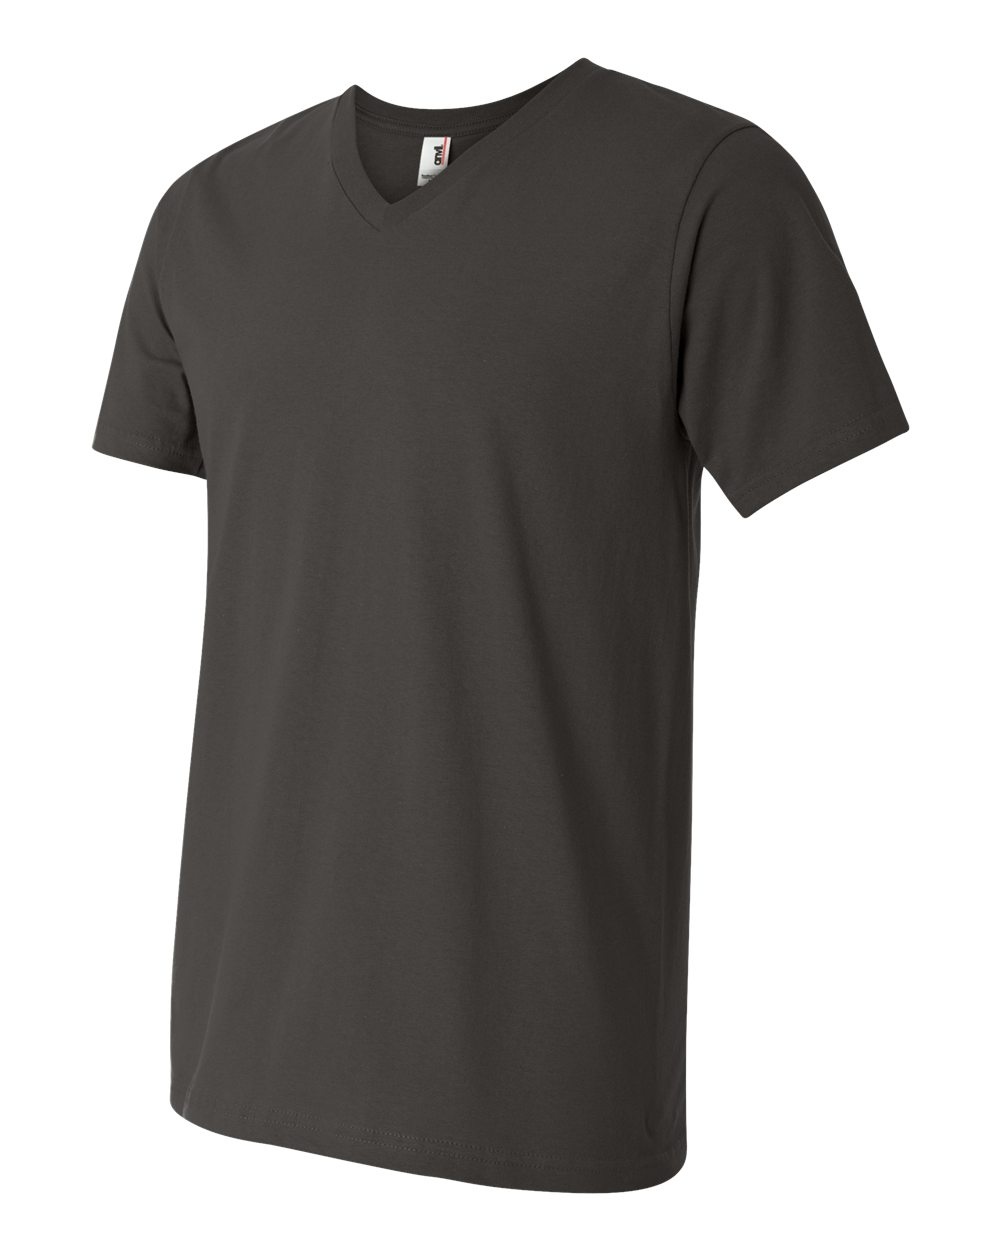 Anvil-Men-039-s-Lightweight-V-Neck-T-Shirt-982-S-3XL thumbnail 24